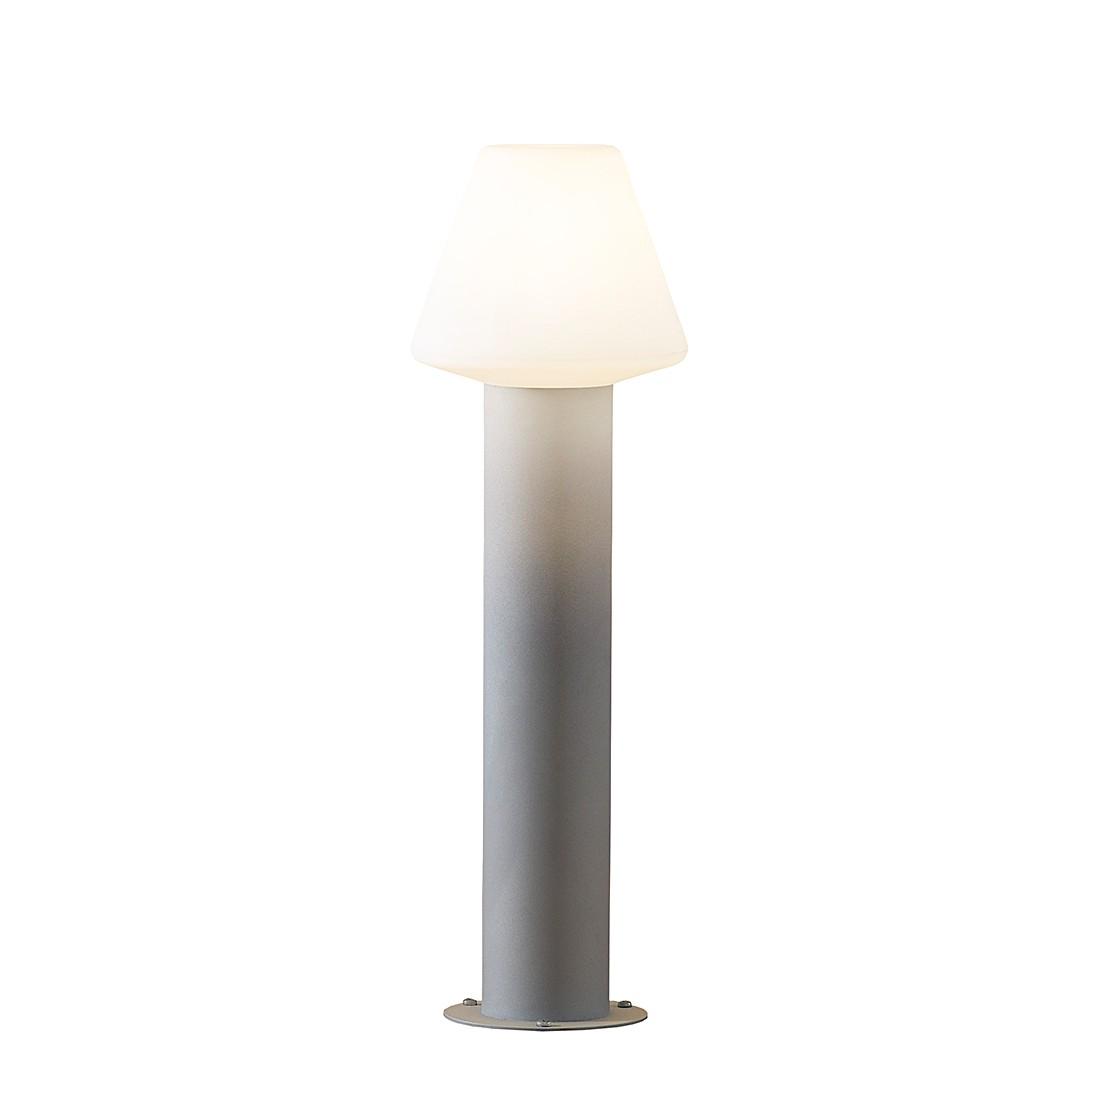 Sockelleuchte Barletta – Aluminium/Glas – 1-flammig, Konstsmide jetzt kaufen